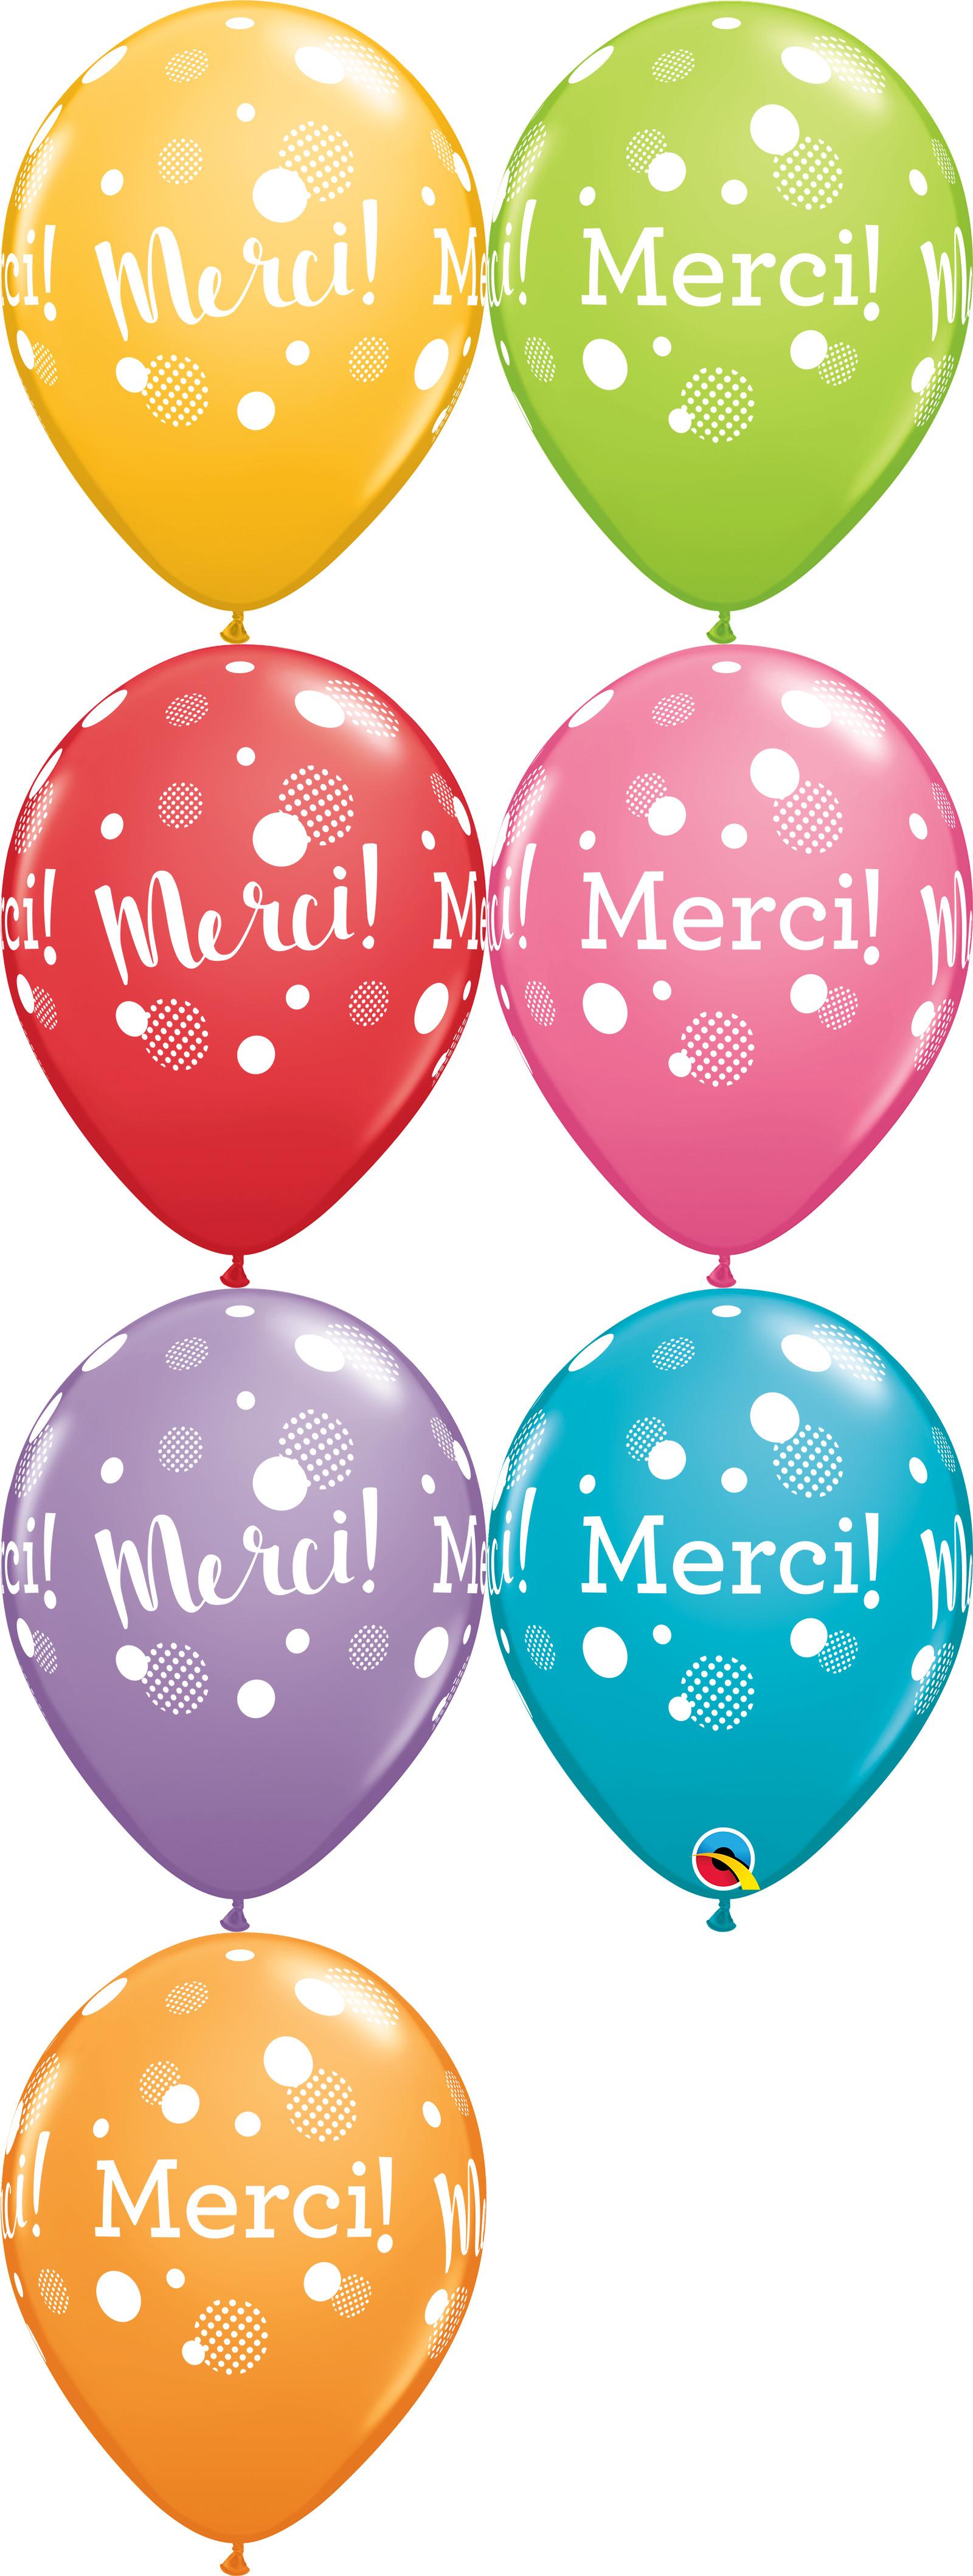 "11"" Festive 50CT Merci Pois Par Dessus Pois Latex Balloons"